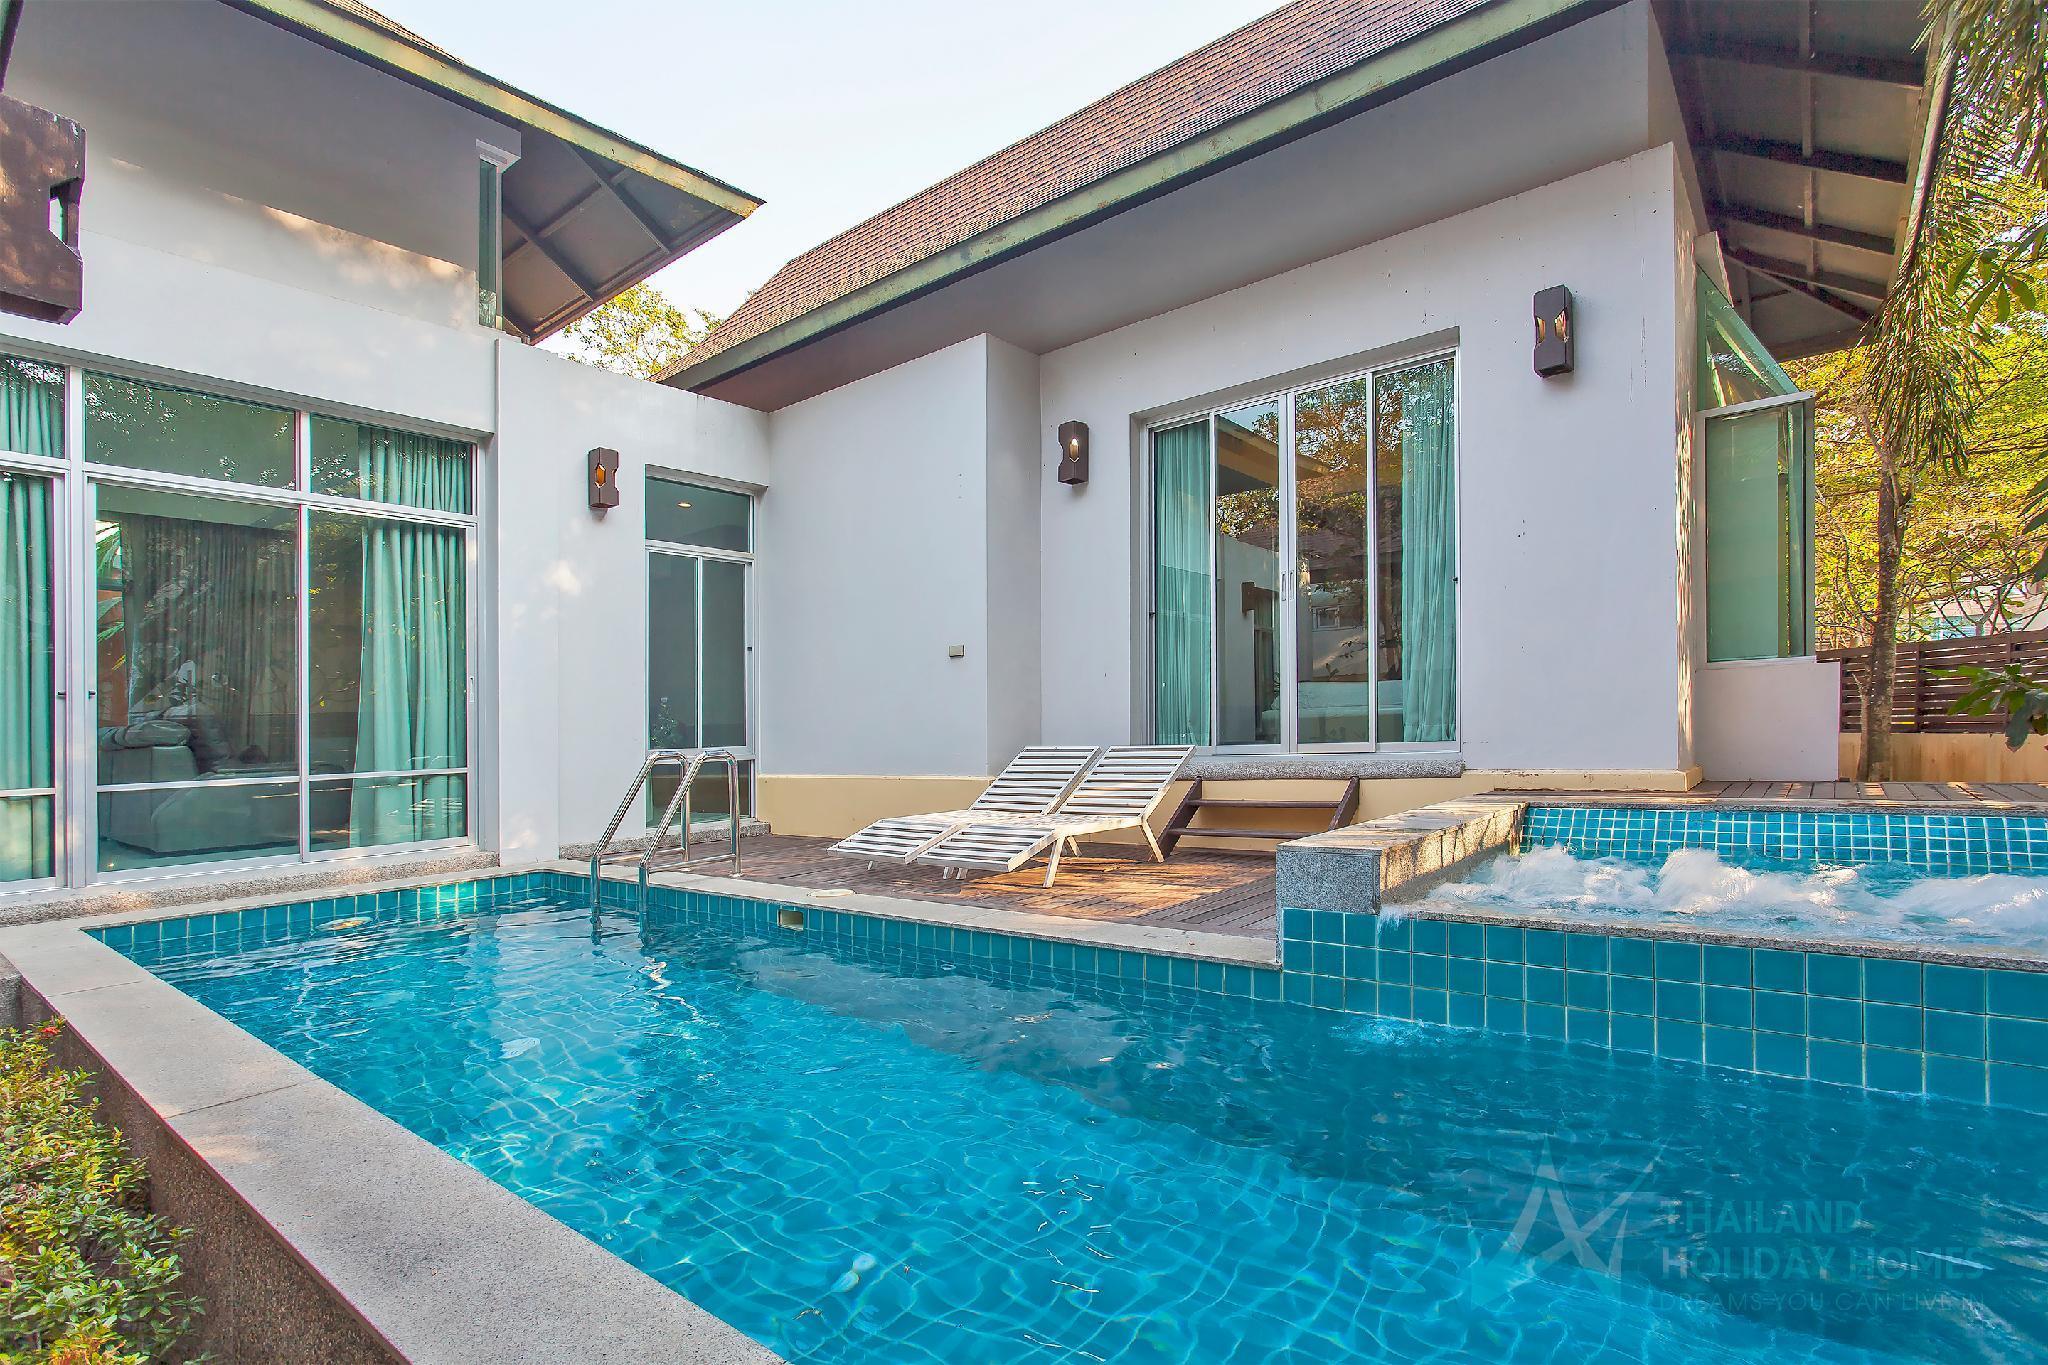 Villa Mentha   Chic 2 Bed Pool Home in Jomtien วิลลา 2 ห้องนอน 2 ห้องน้ำส่วนตัว ขนาด 130 ตร.ม. – นาจอมเทียน